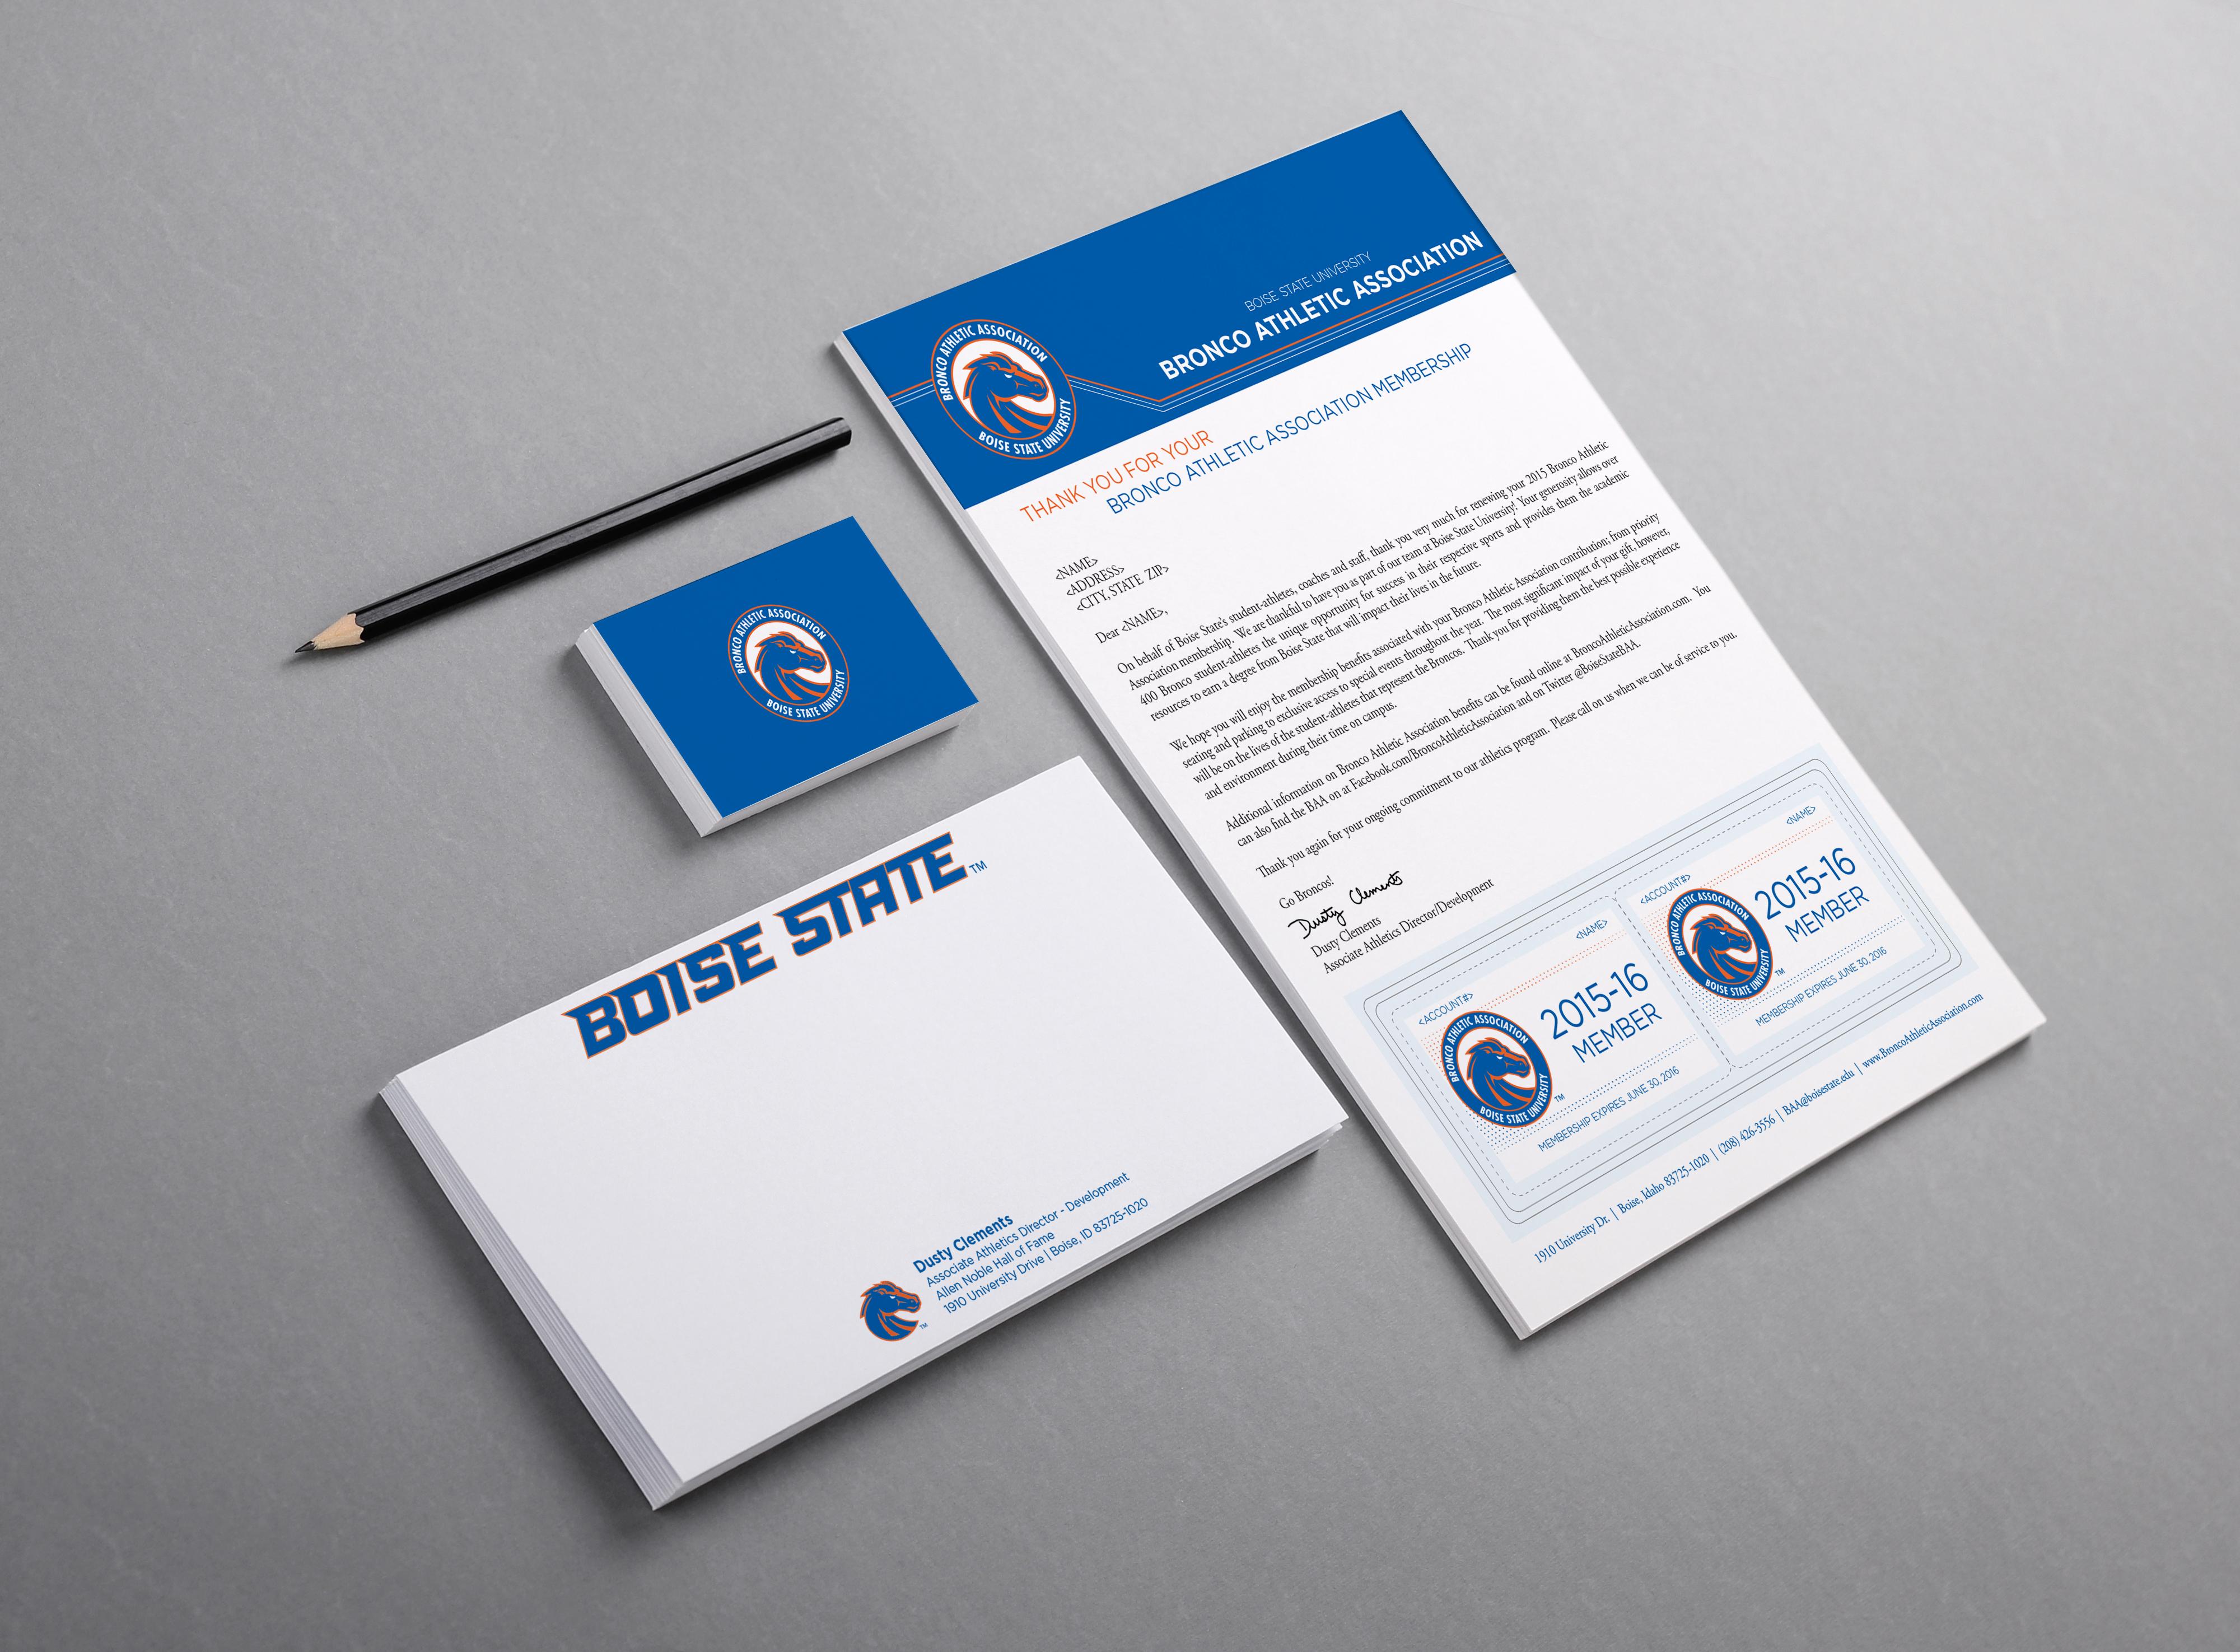 Membership, Thank you's & bus. cards